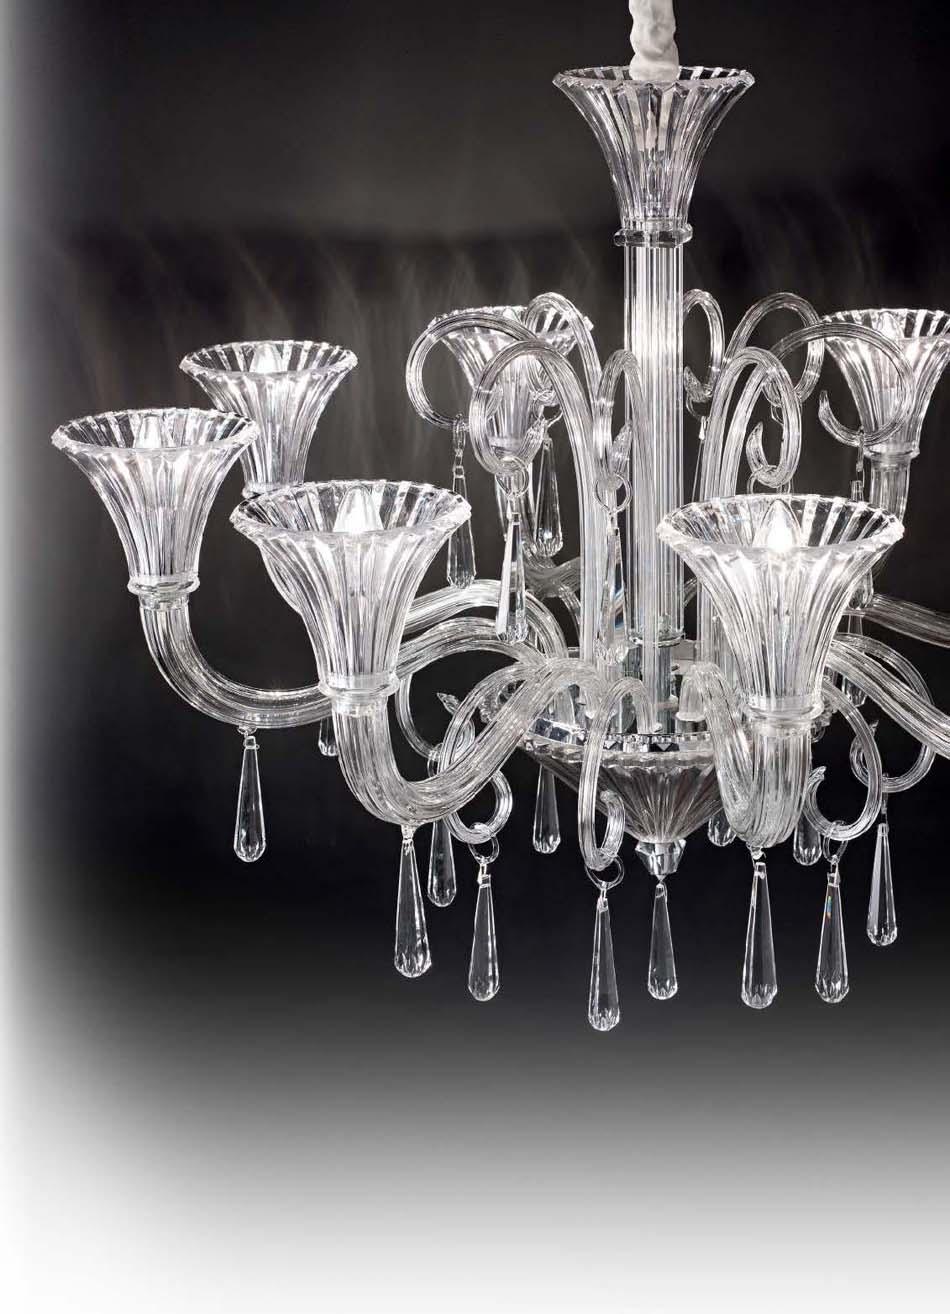 Lampade 37 sospese vintage Ideal Lux Santa – Toscana Arredamenti